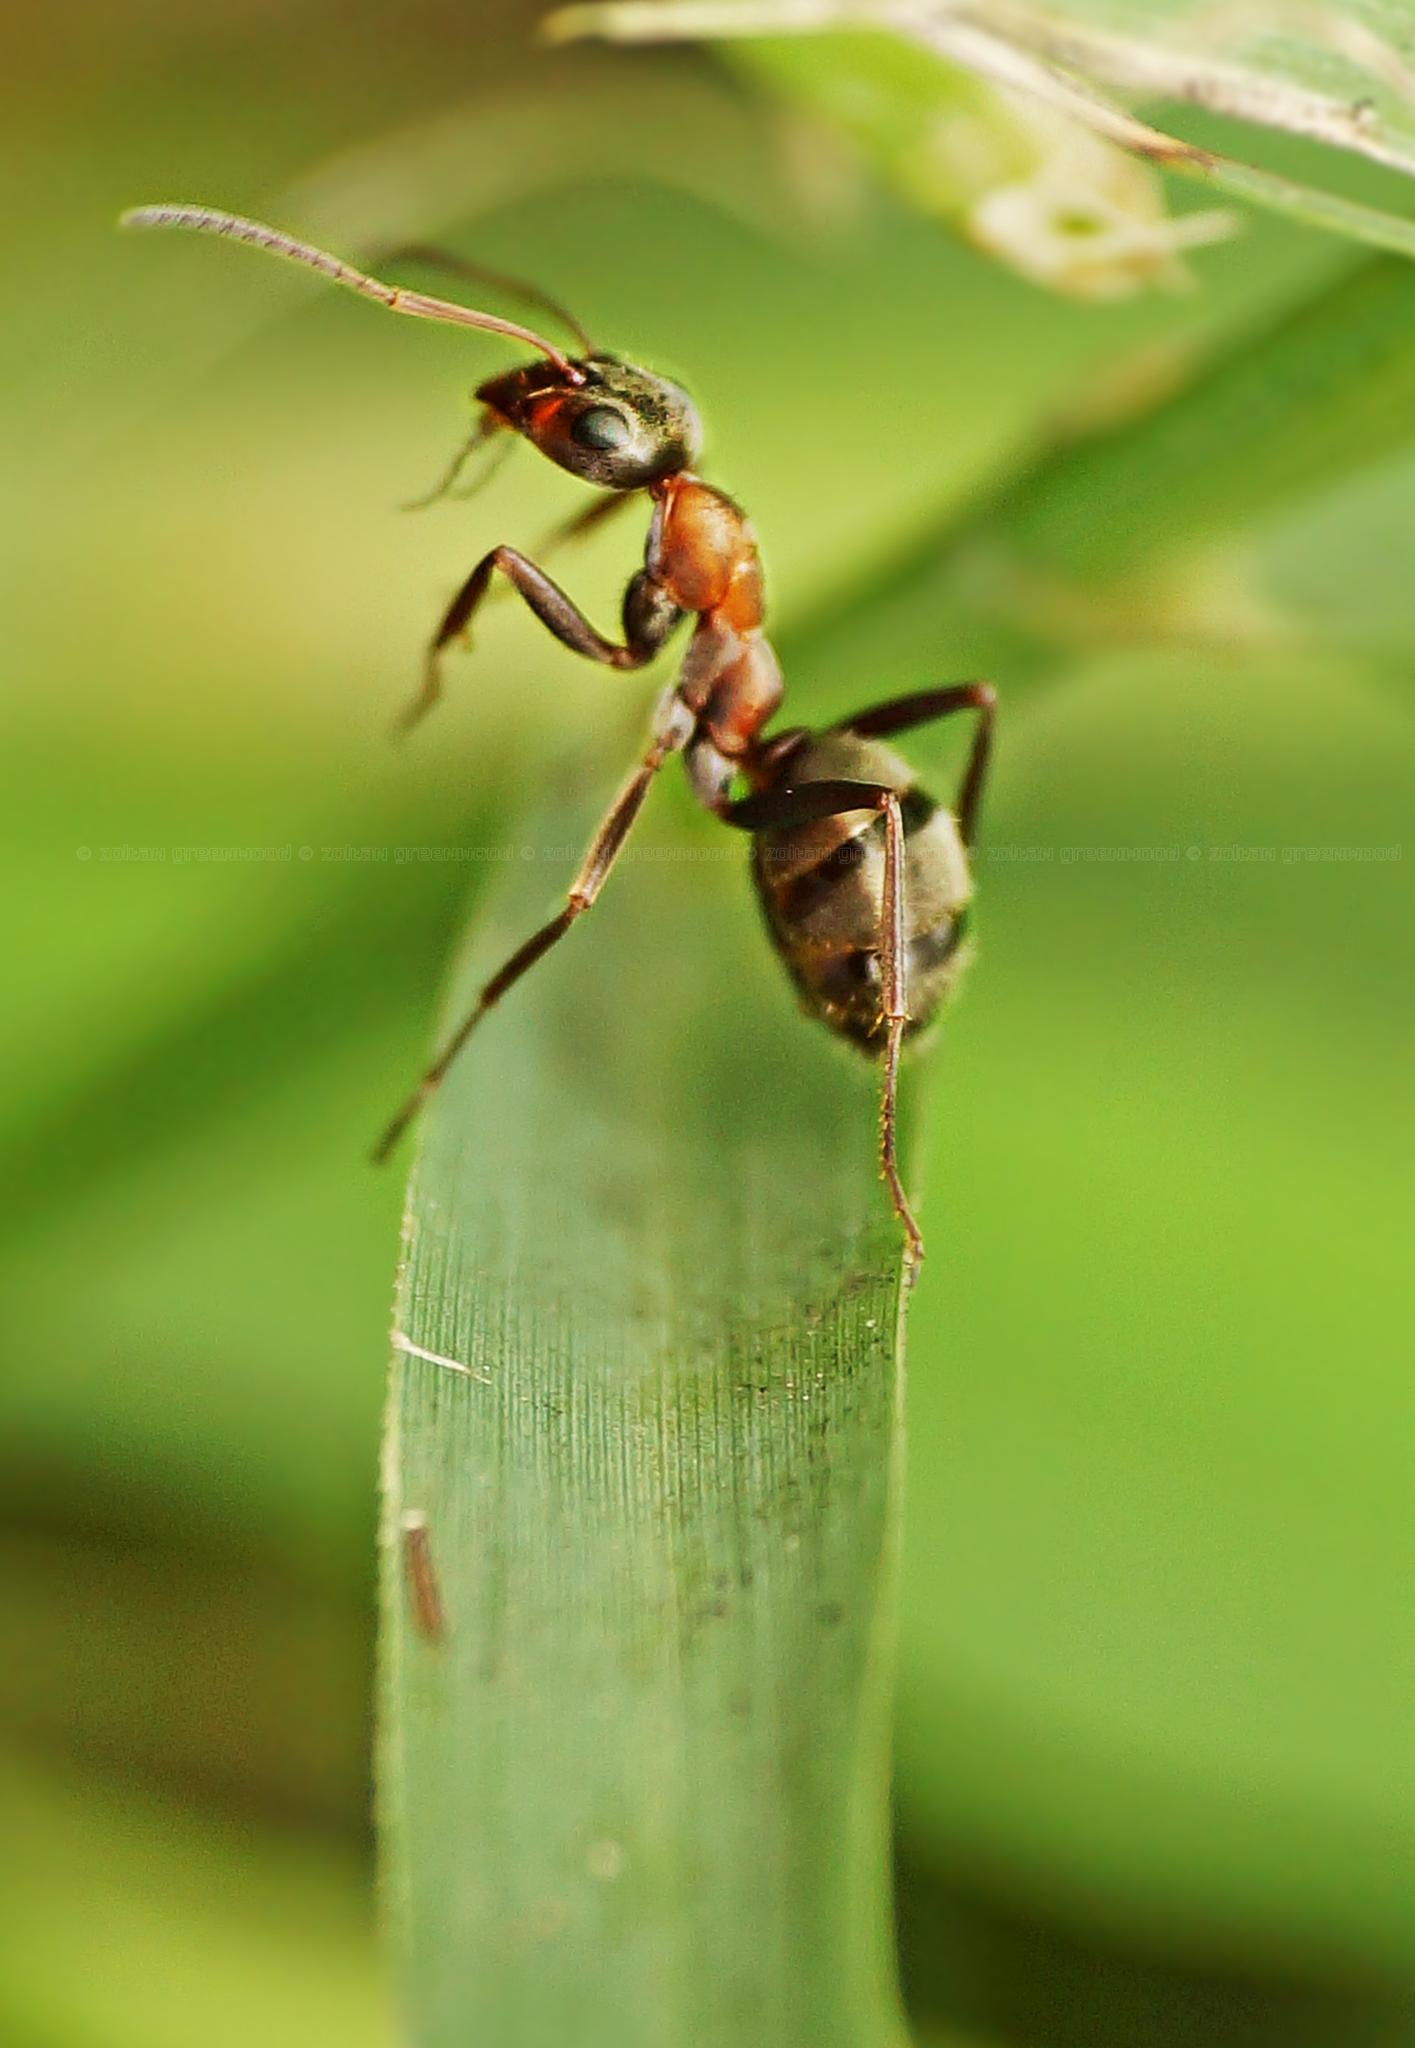 Ant  by Zoltán Grünvald